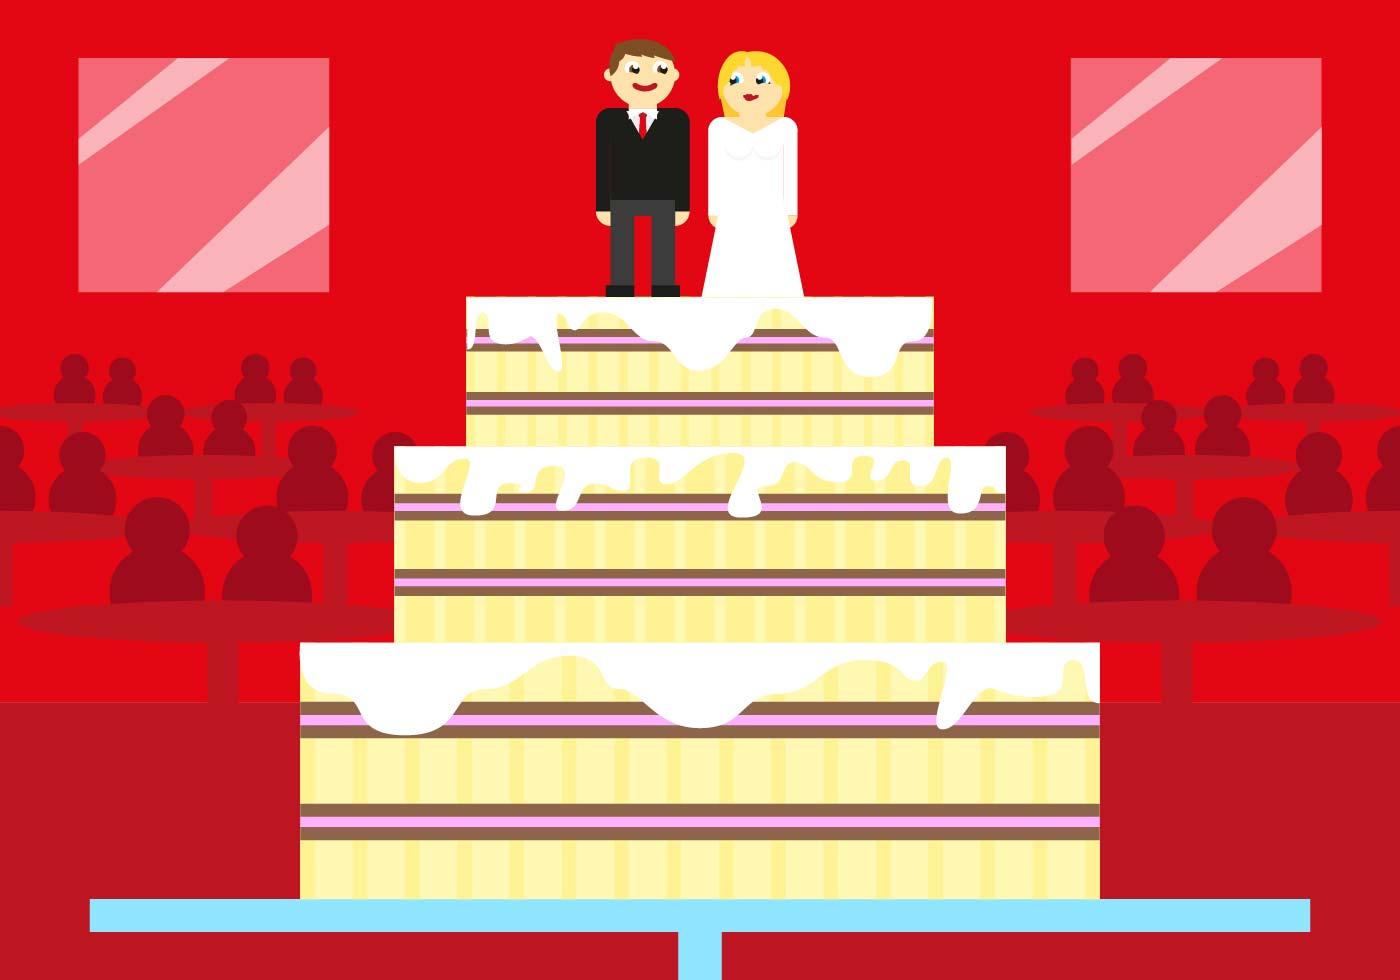 Boda Wedding Cake Vector Illustration - Download Free Vector Art ...